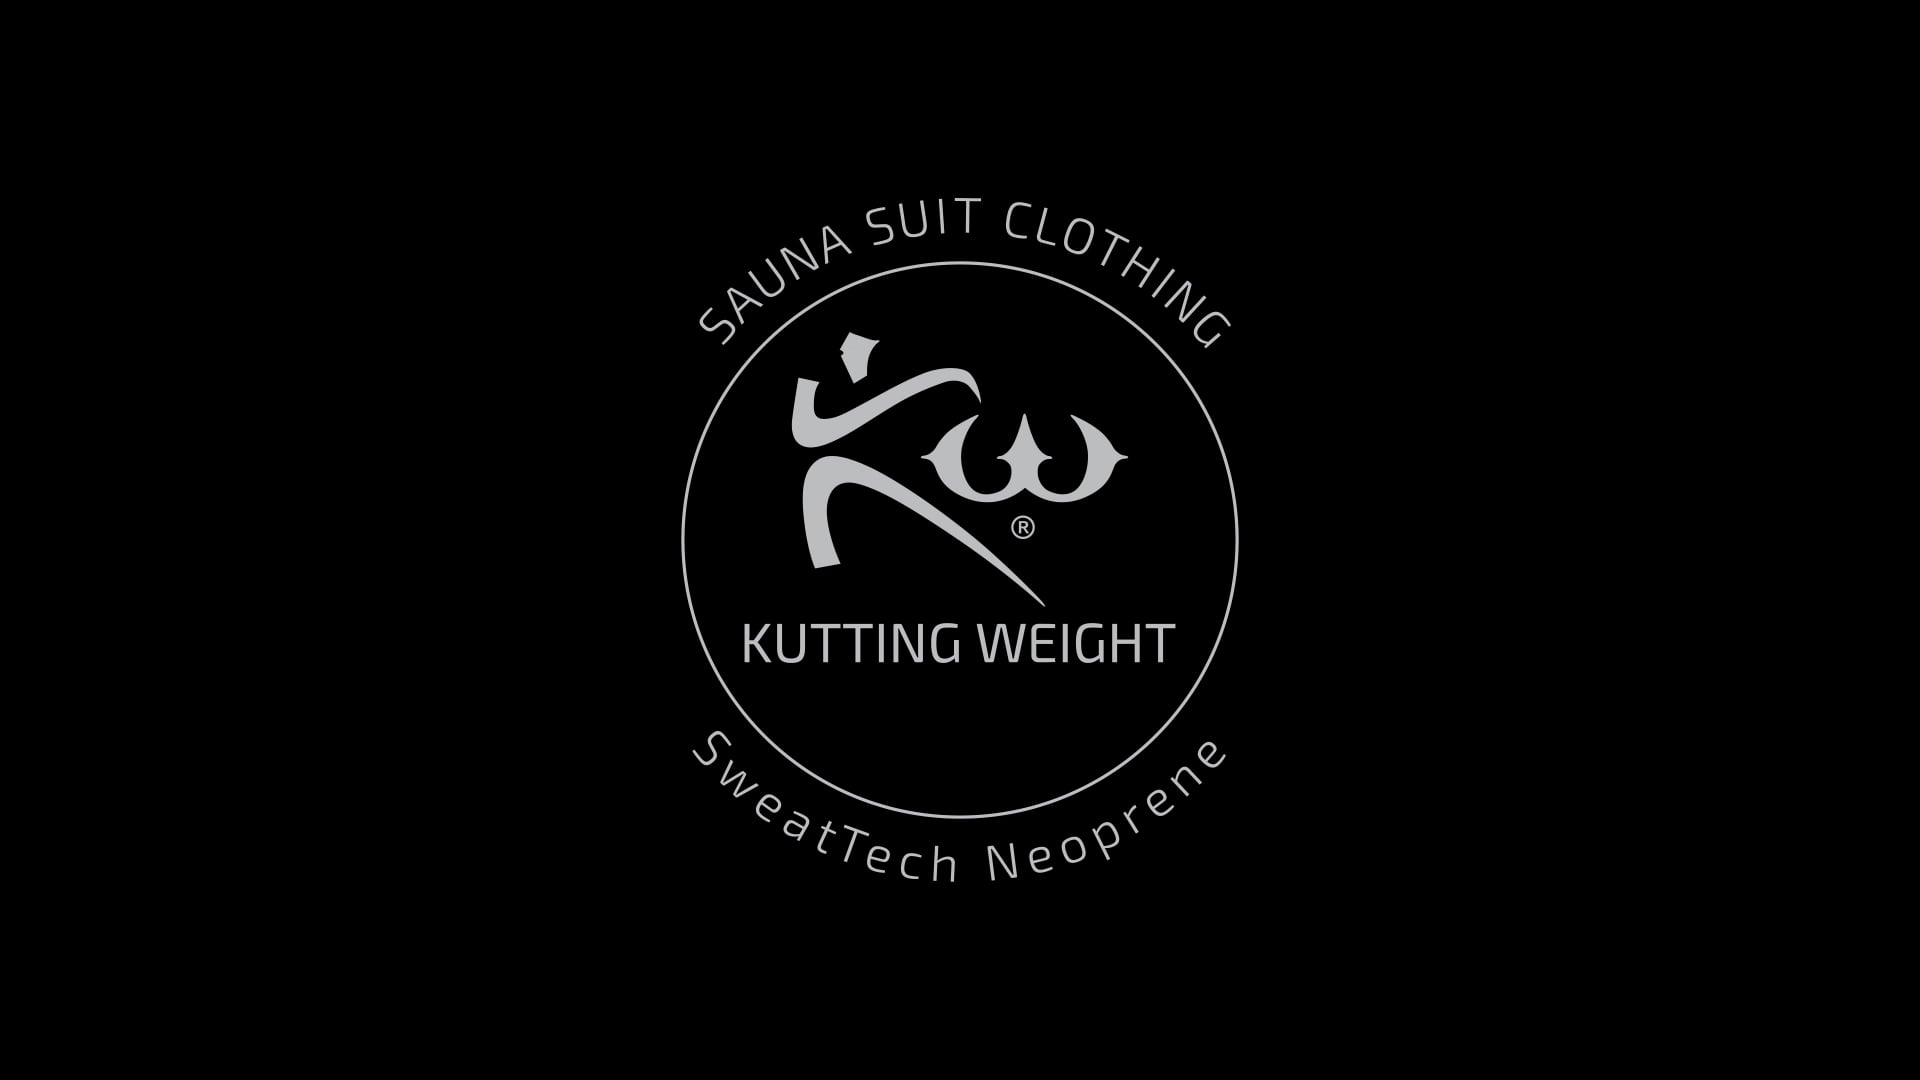 Kutting Weight - SaunaSuit